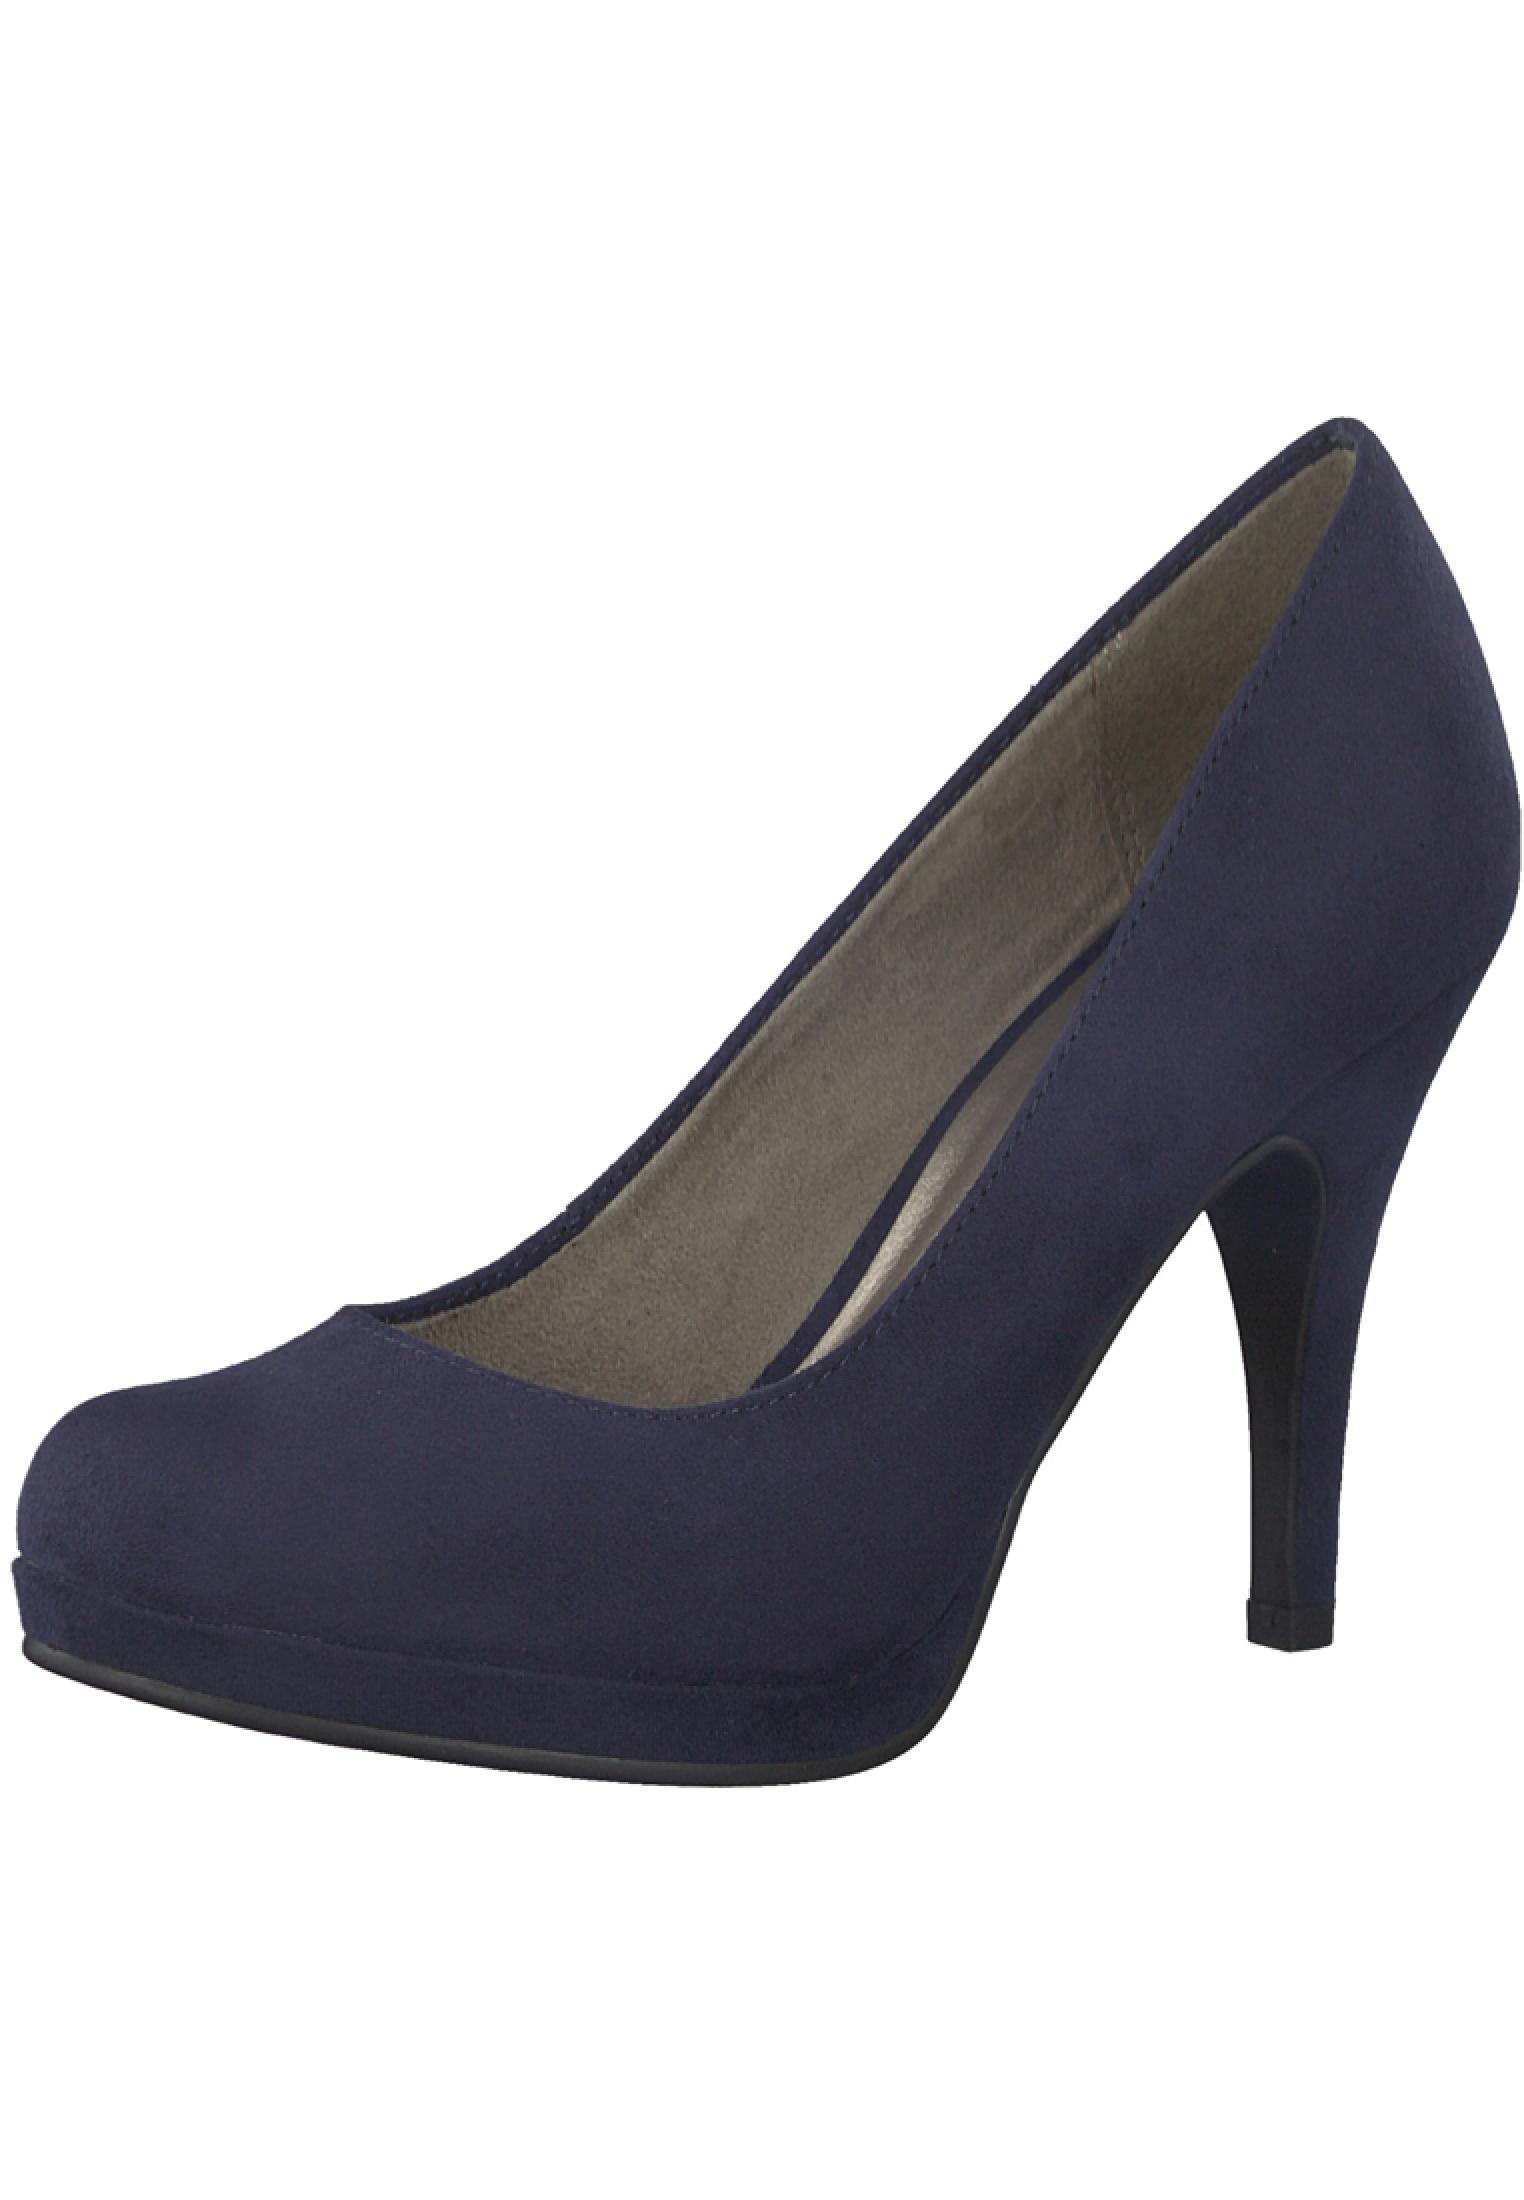 tamaris 1 22407 20 805 damen navy blau plateau pumps high heel damenschuhe pumps plateau pumps. Black Bedroom Furniture Sets. Home Design Ideas